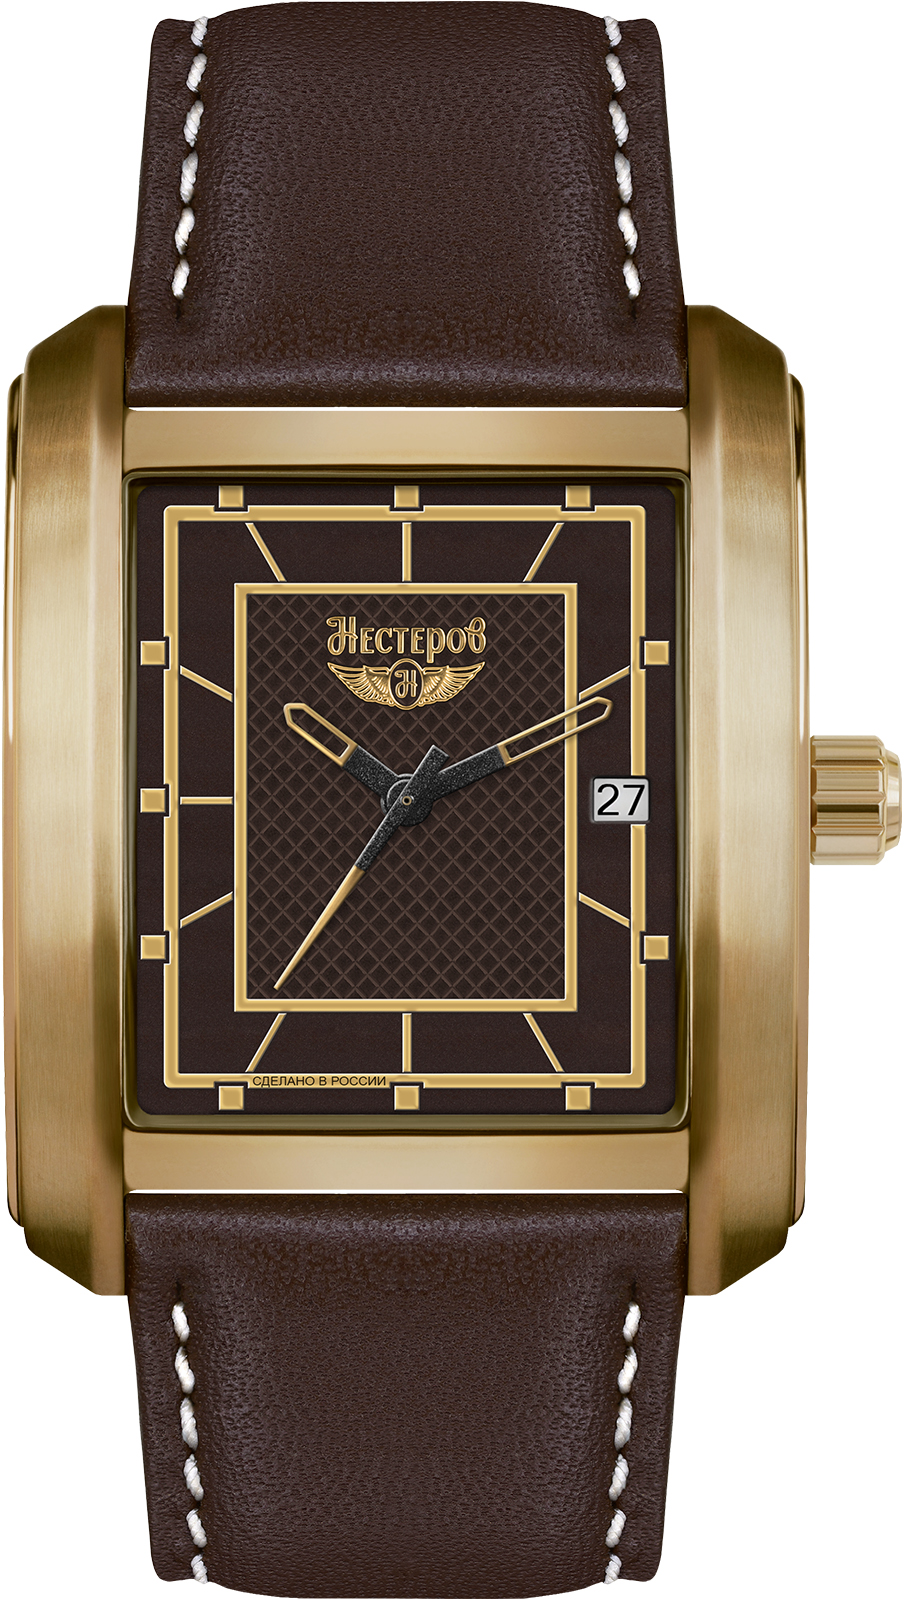 Наручные часы Нестеров H0958B12-16BR наручные мужские часы тяжелые